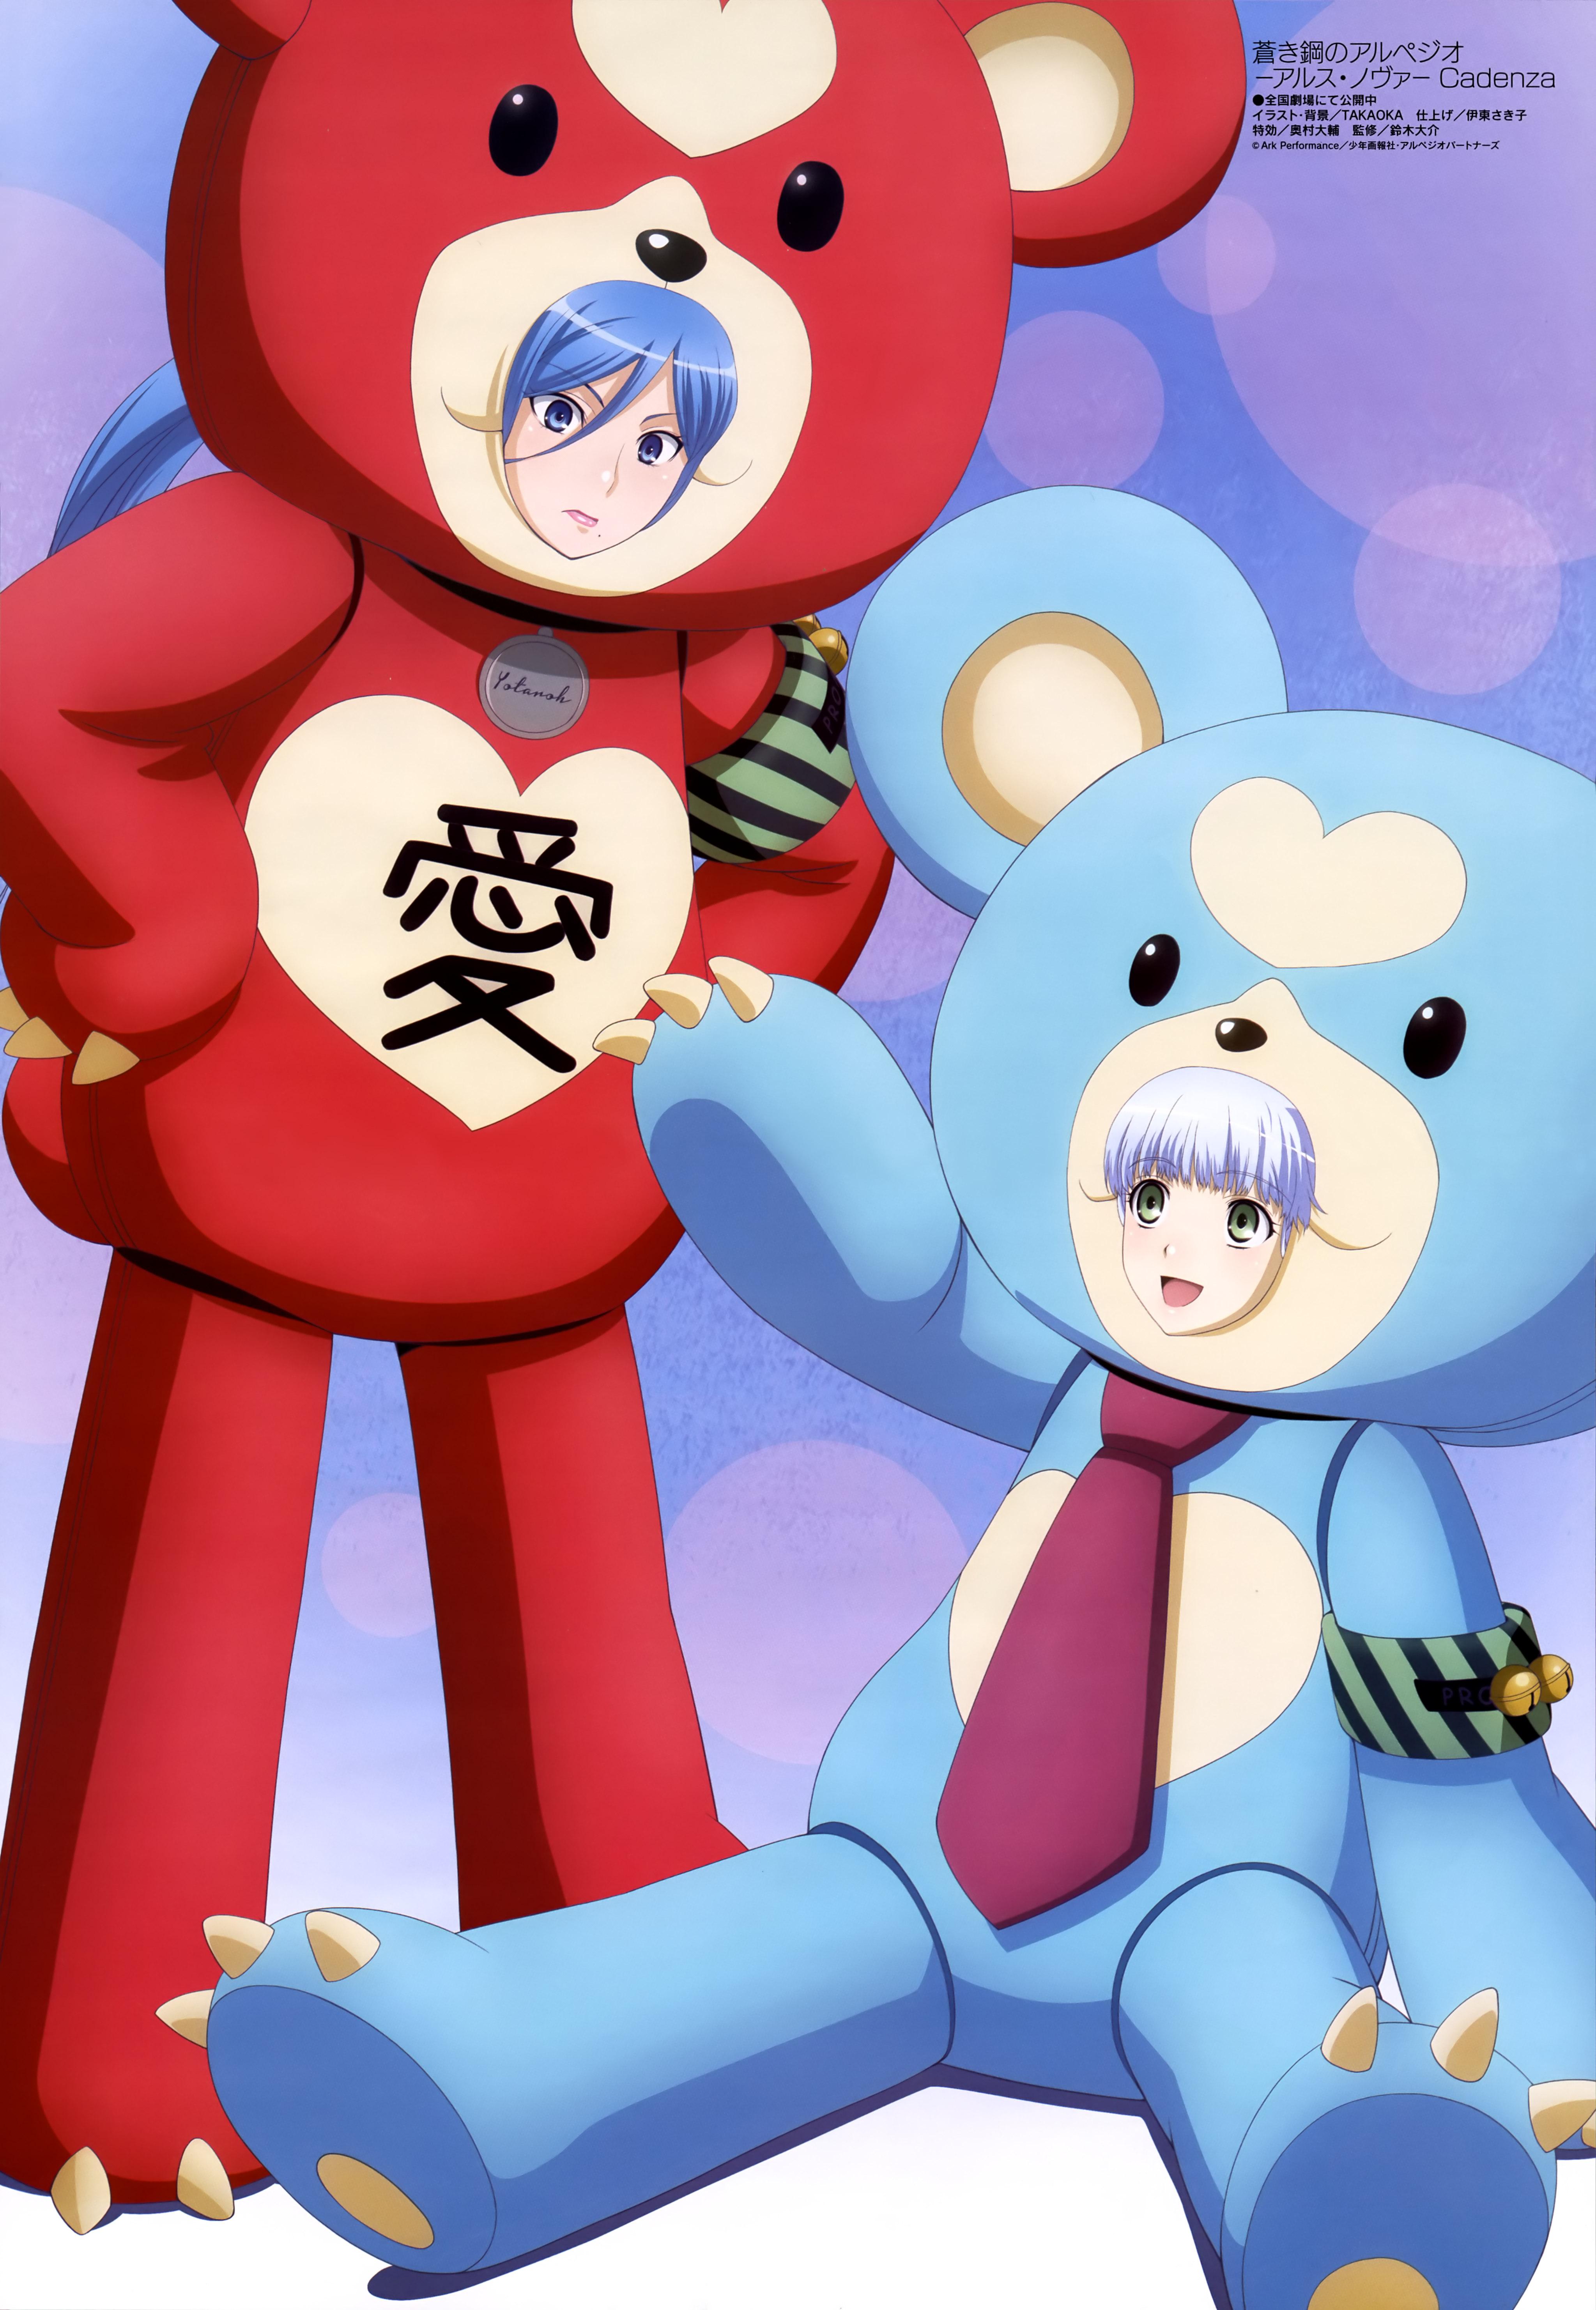 Megami-Magazine-January-2016-anime-poster-aoki hagane no arpeggio